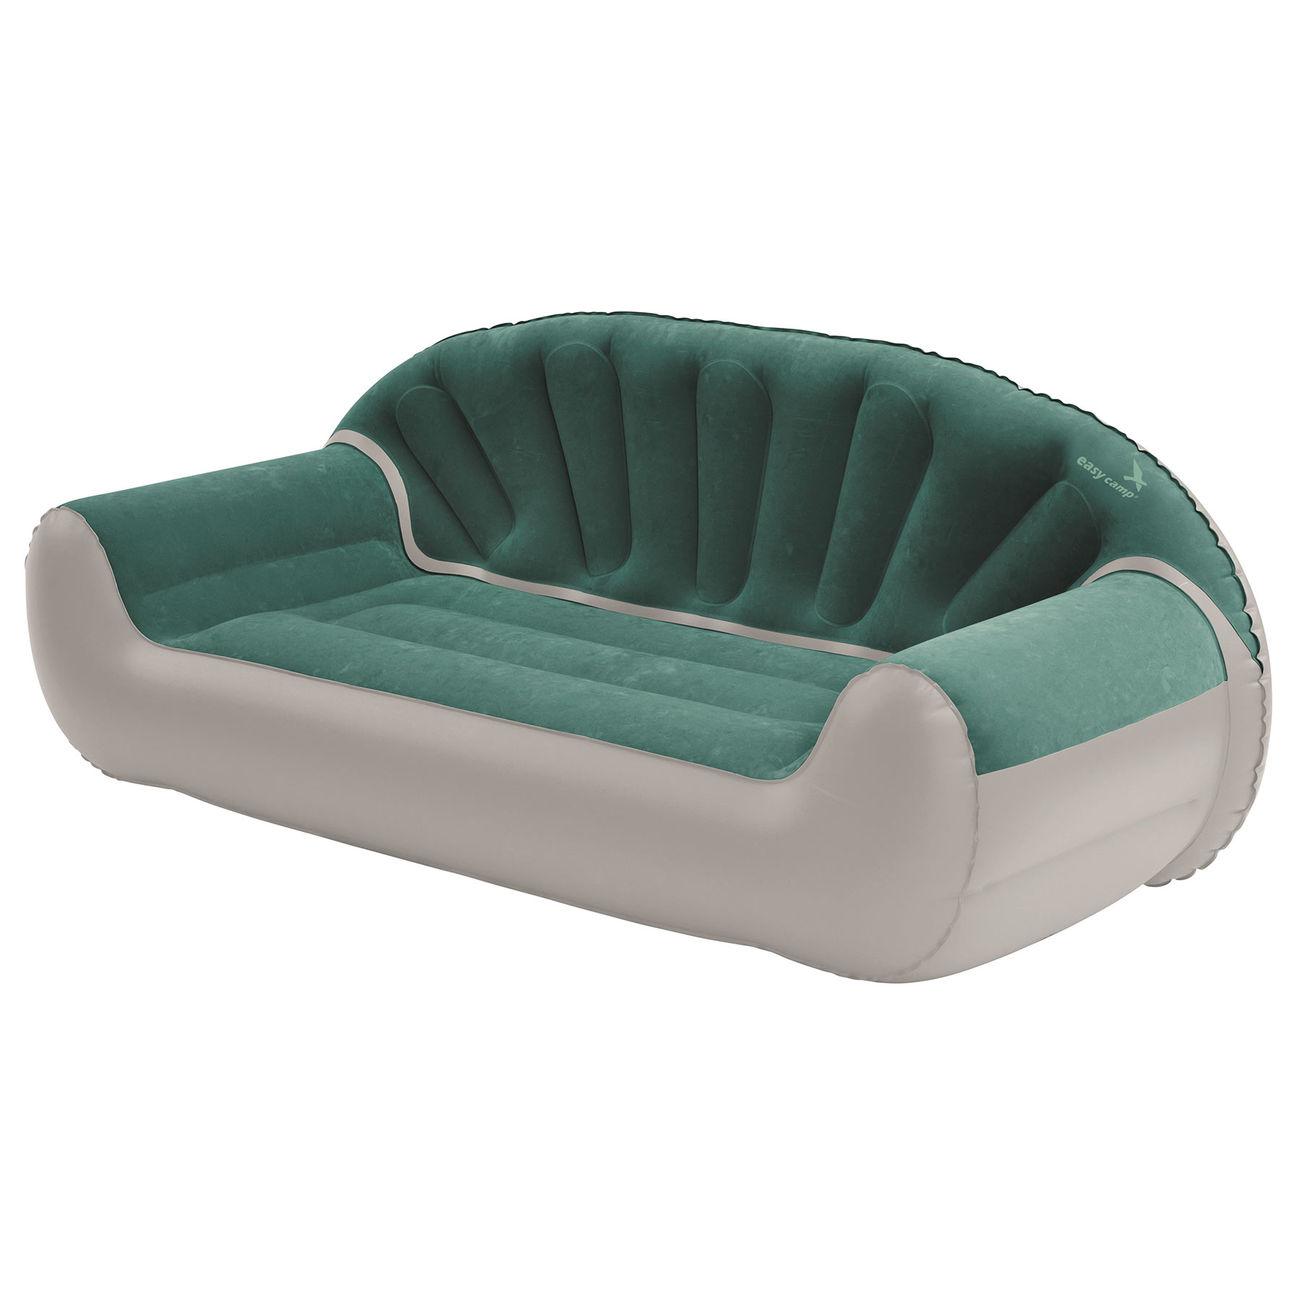 Marvelous Easy Camp Aufblasbares Outdoor Sofa Comfy Sofa Machost Co Dining Chair Design Ideas Machostcouk